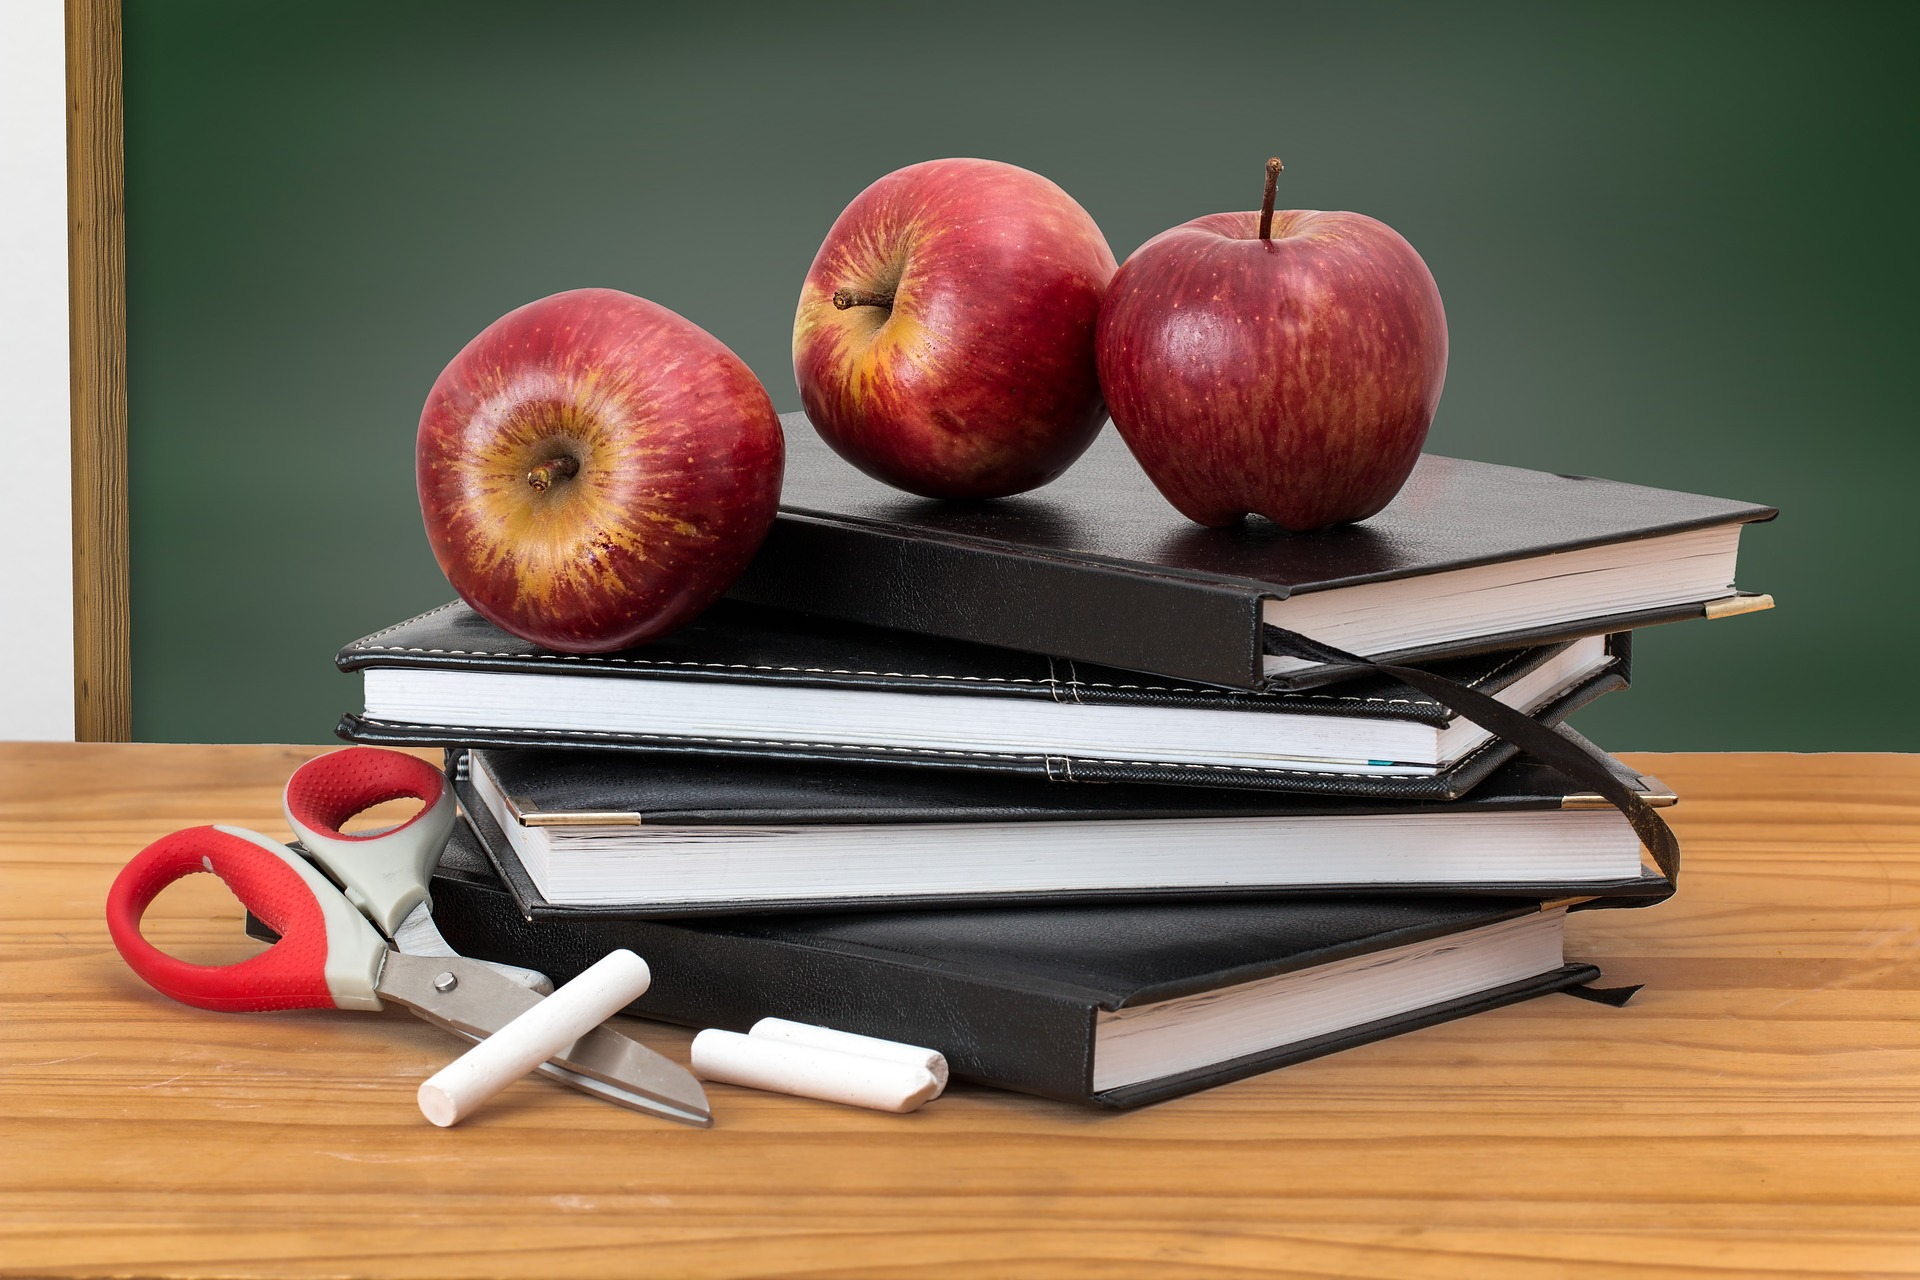 school-2276269_1920_1494855167552.jpg